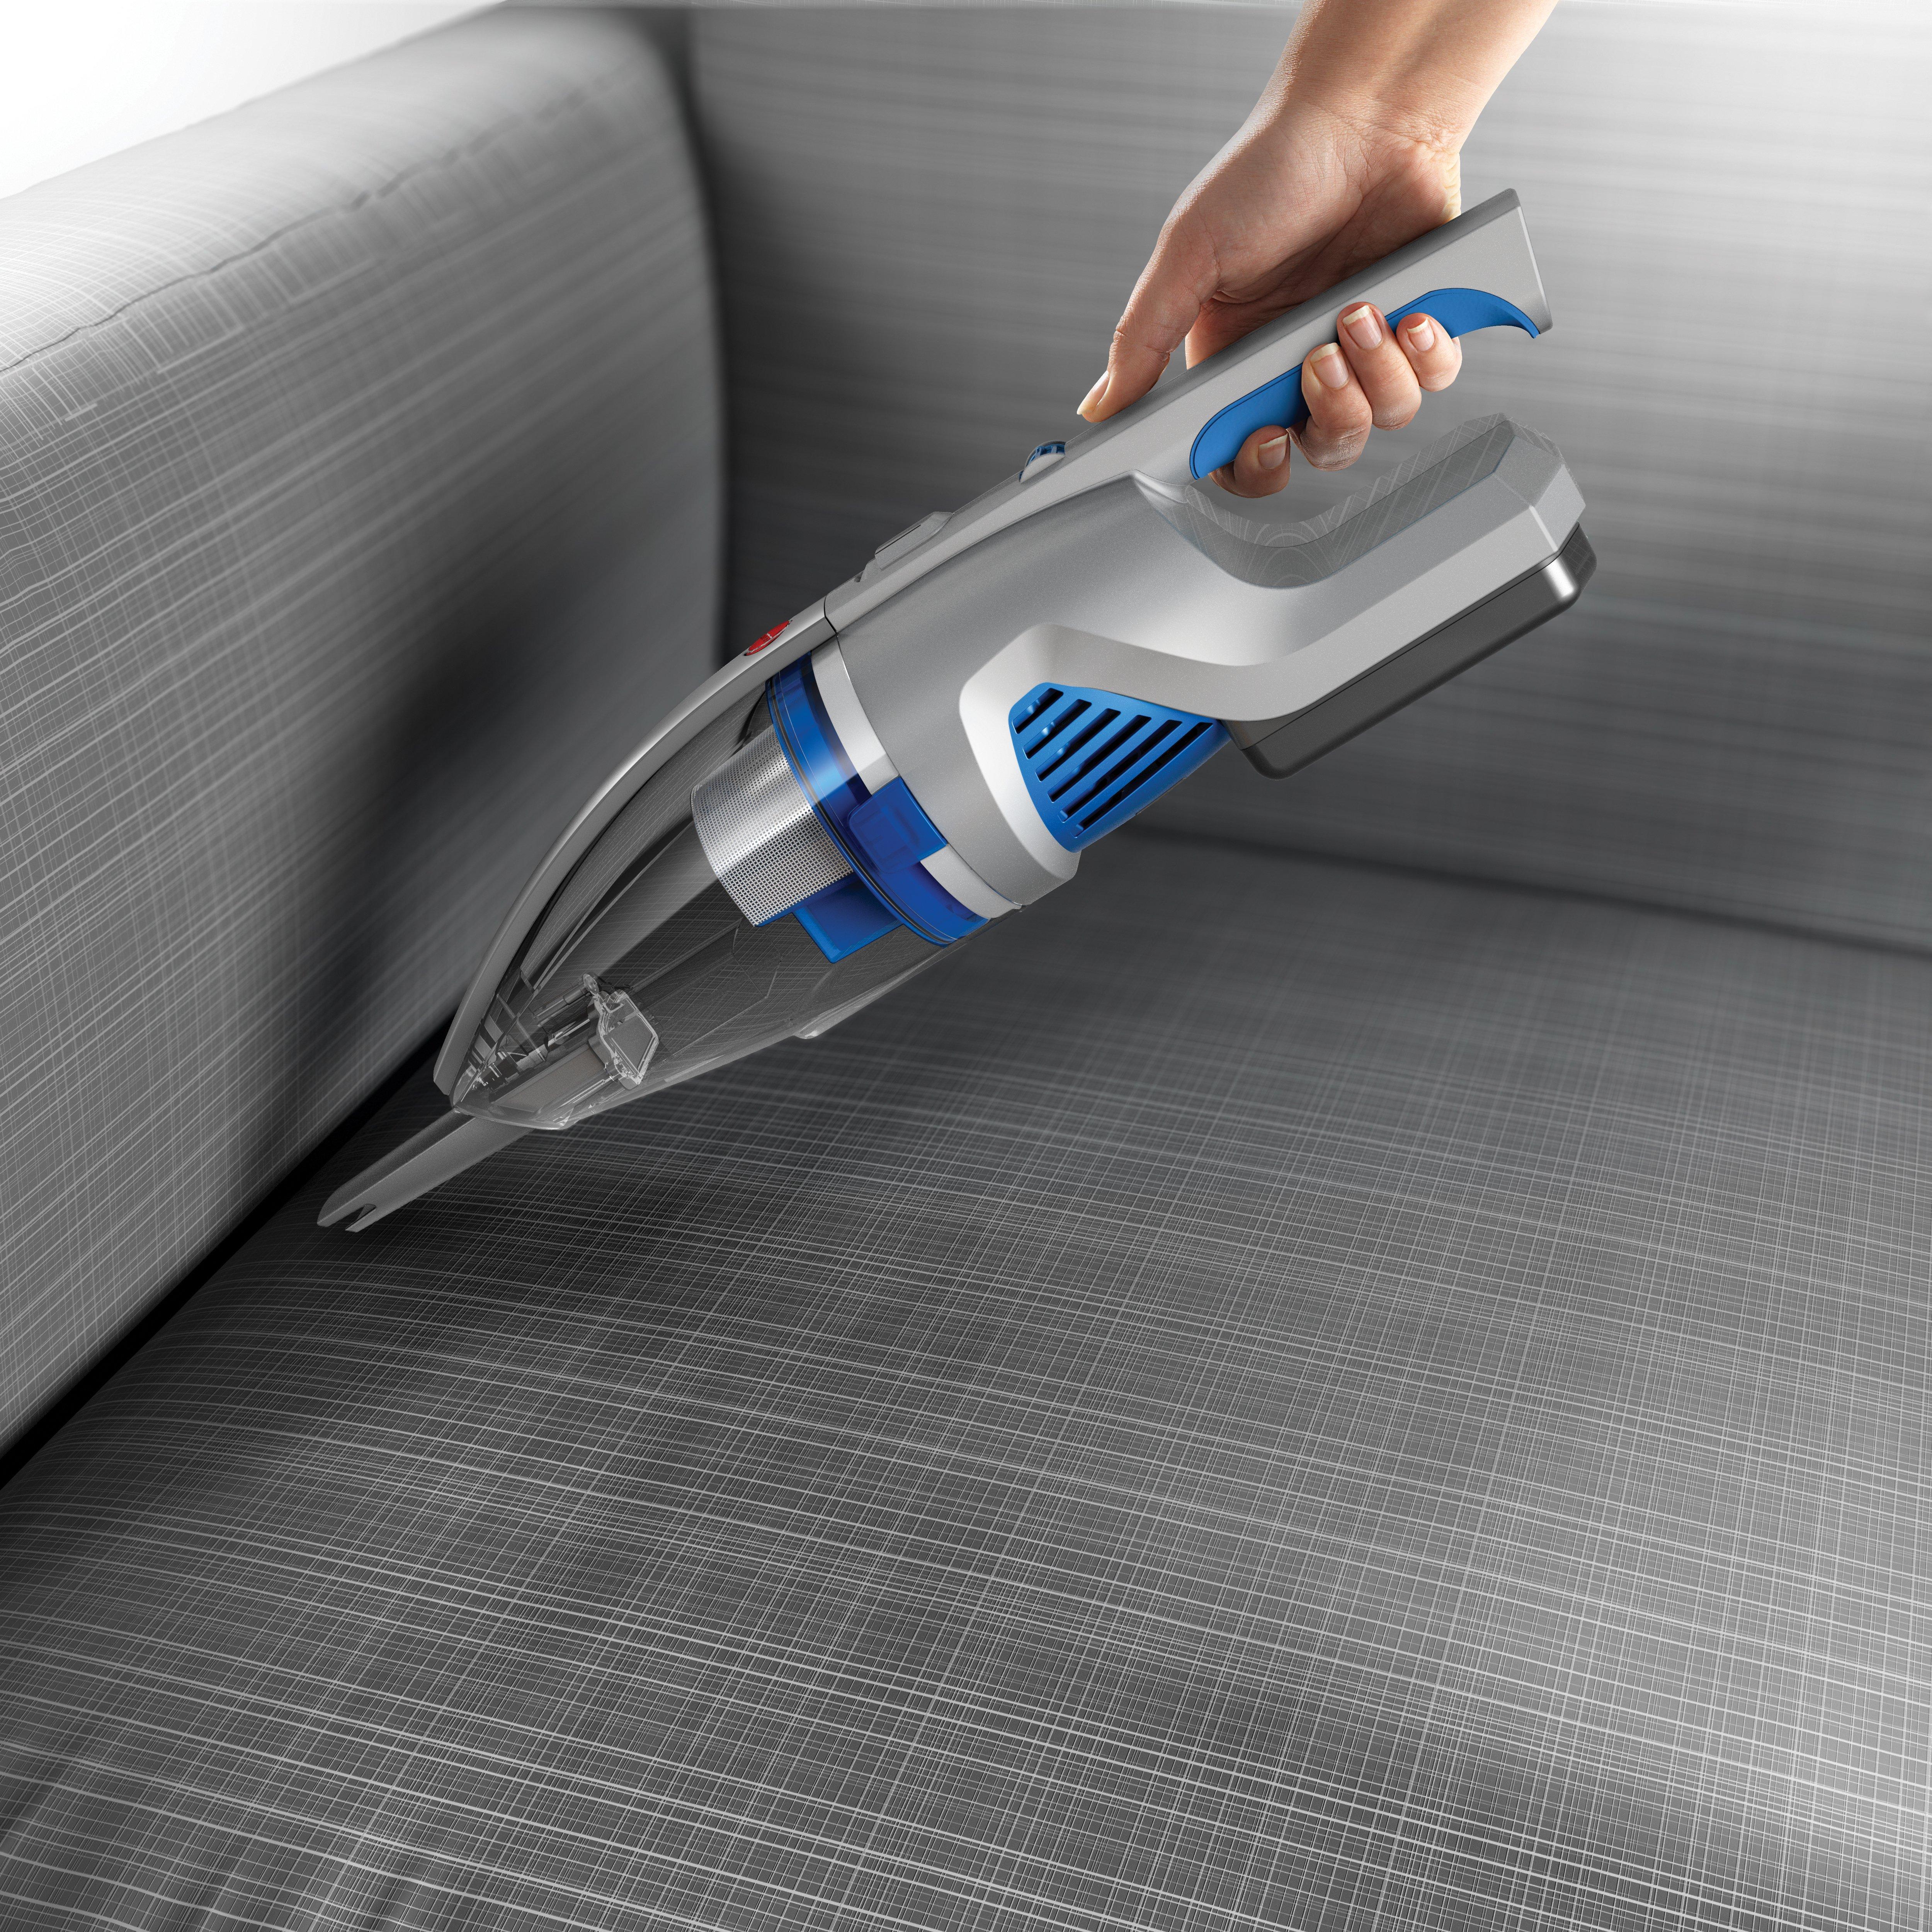 ... Tti Floor Care North America Glassdoor By Tti Floor Care Wikipedia 100  Images Techtronic Industries ...